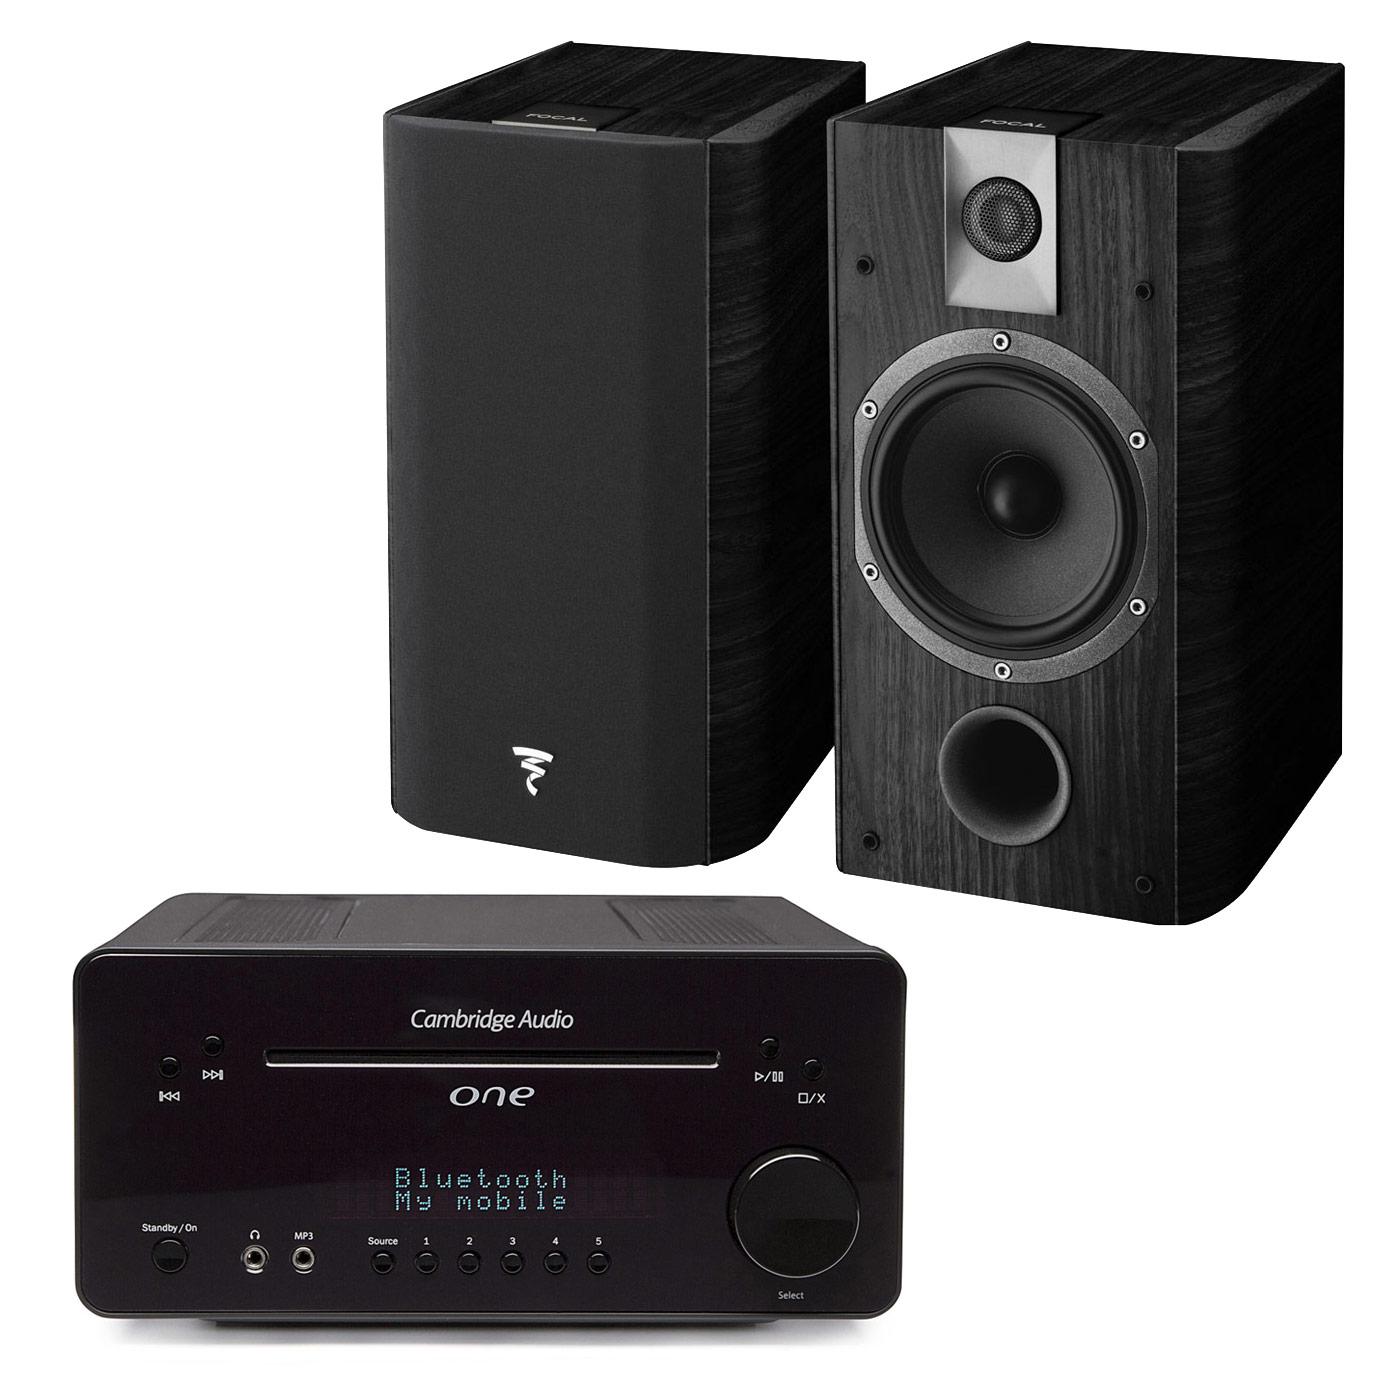 Ensemble Hifi Cambridge One Noir + Focal Chorus 605 Black Style Ampli-tuner 2 x 30 Watts - Lecteur CD/MP3 - Tuner FM/DAB+ - Bluetooth - DAC Wolfson 24bits/96kHz + Enceinte bibliothèque (par paire)